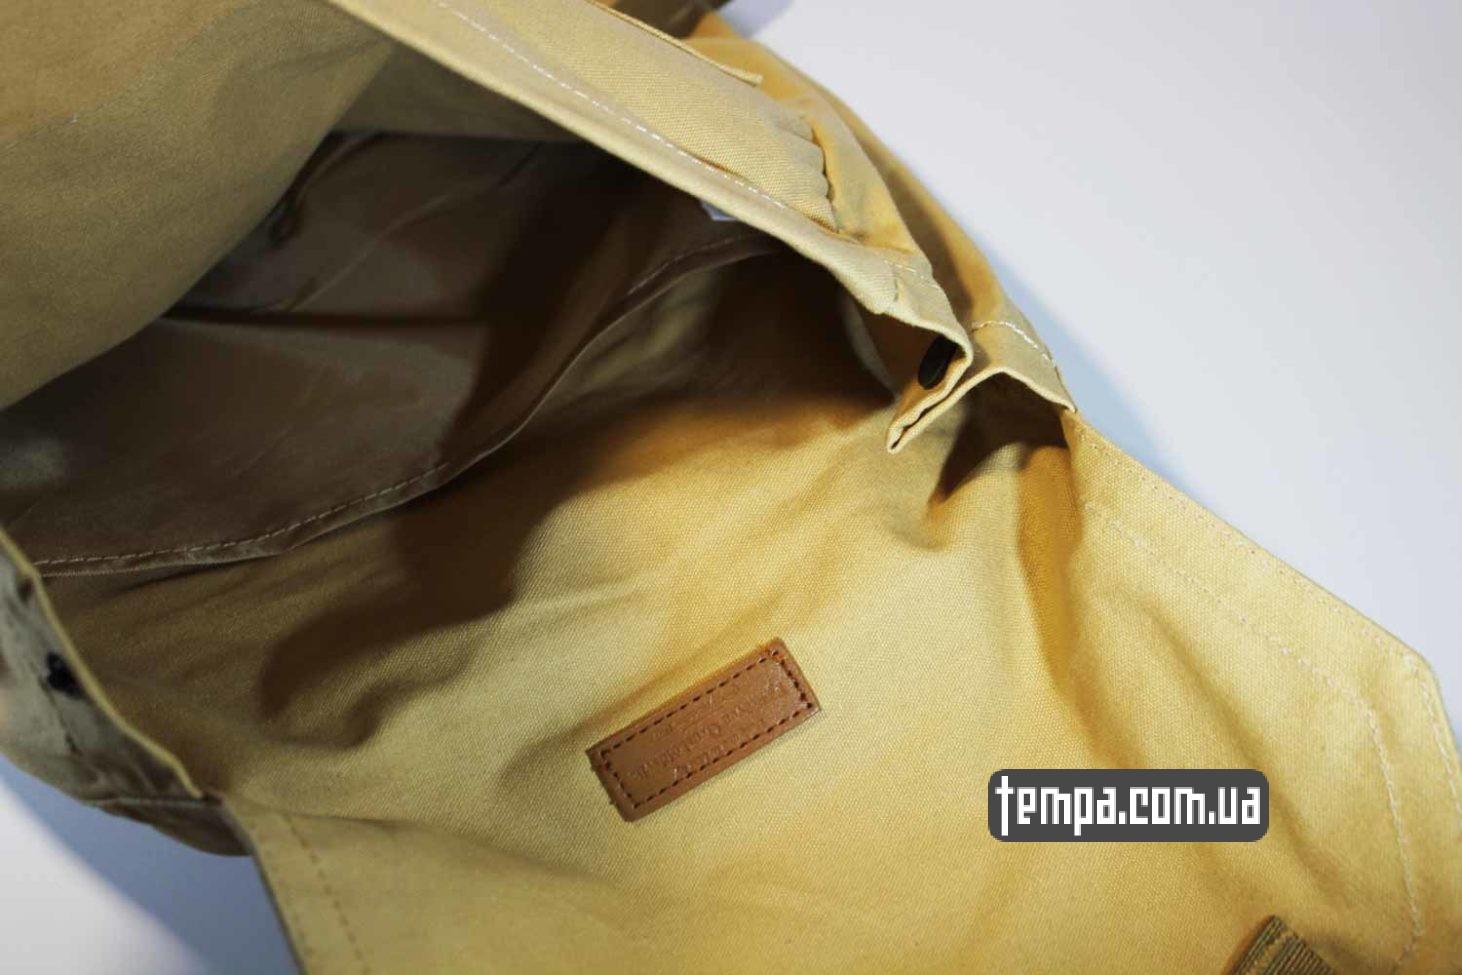 двойной с прокладкой ортепедический рюкзак сумка Fjallraven Foldsack No.1 Backpack бежевый